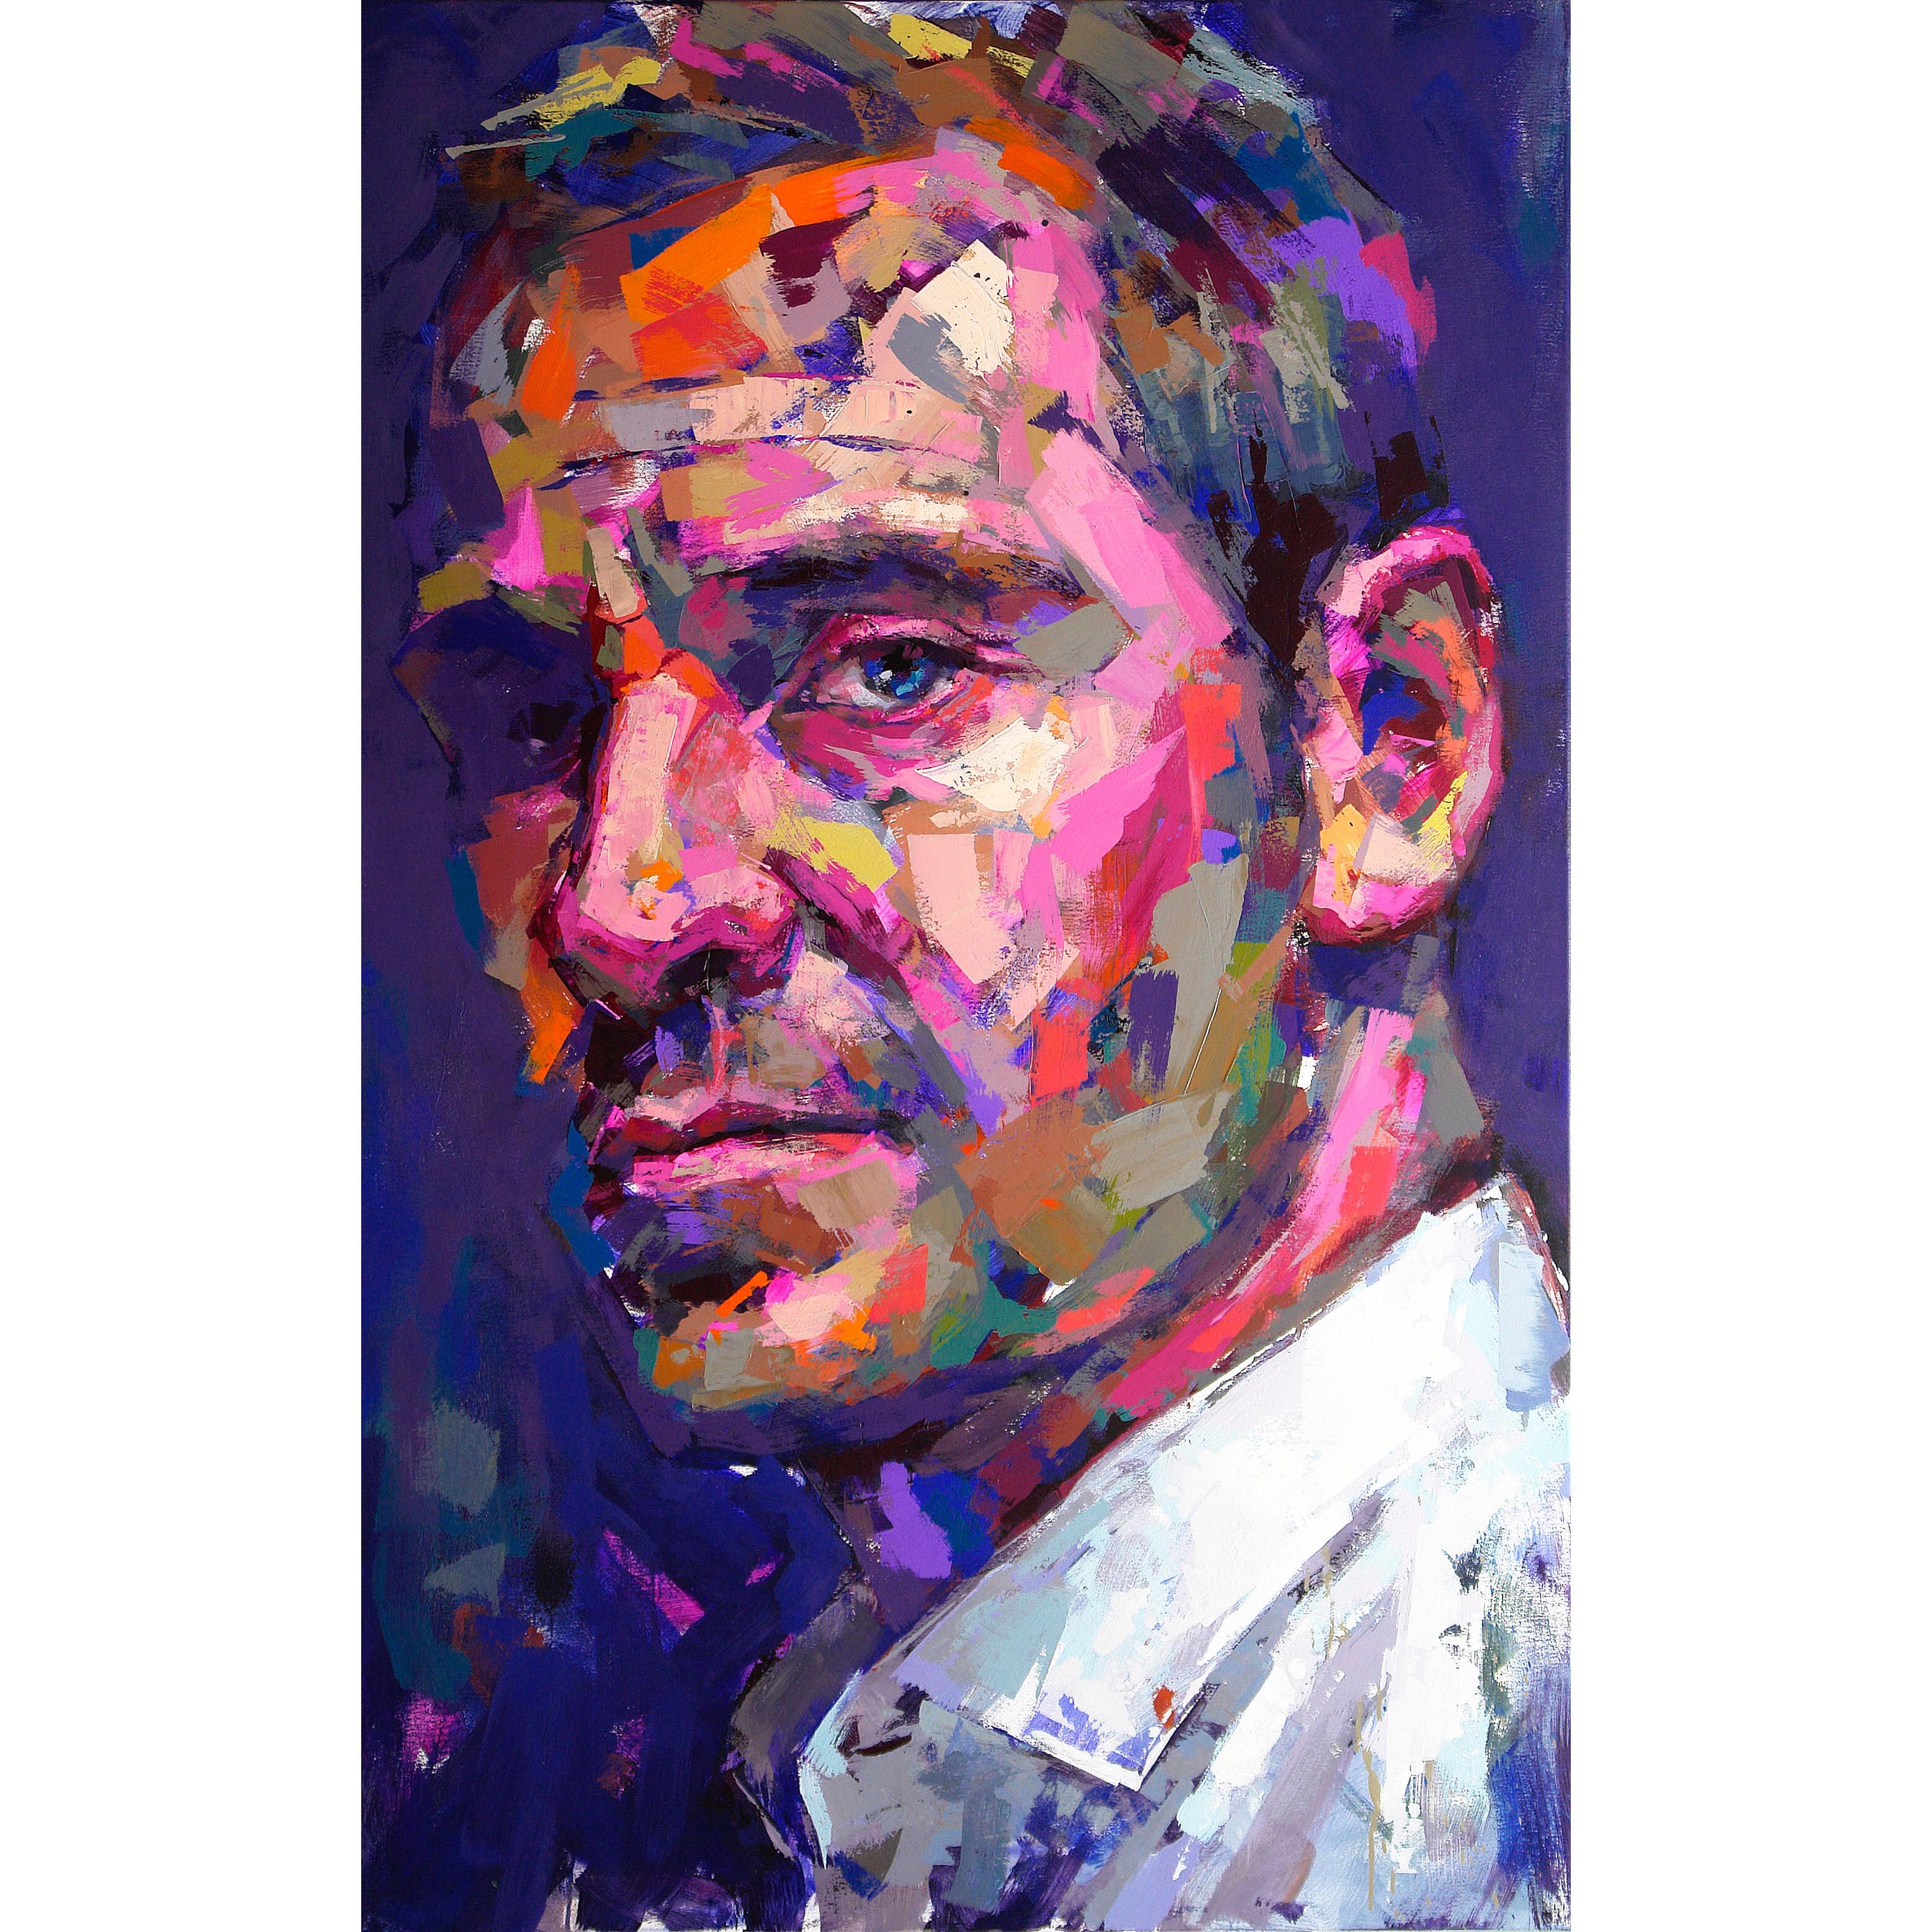 """Michael Fassbender"" Acrylic on canvas by Alberto Ramirez LEG. 160 x 100 cm"